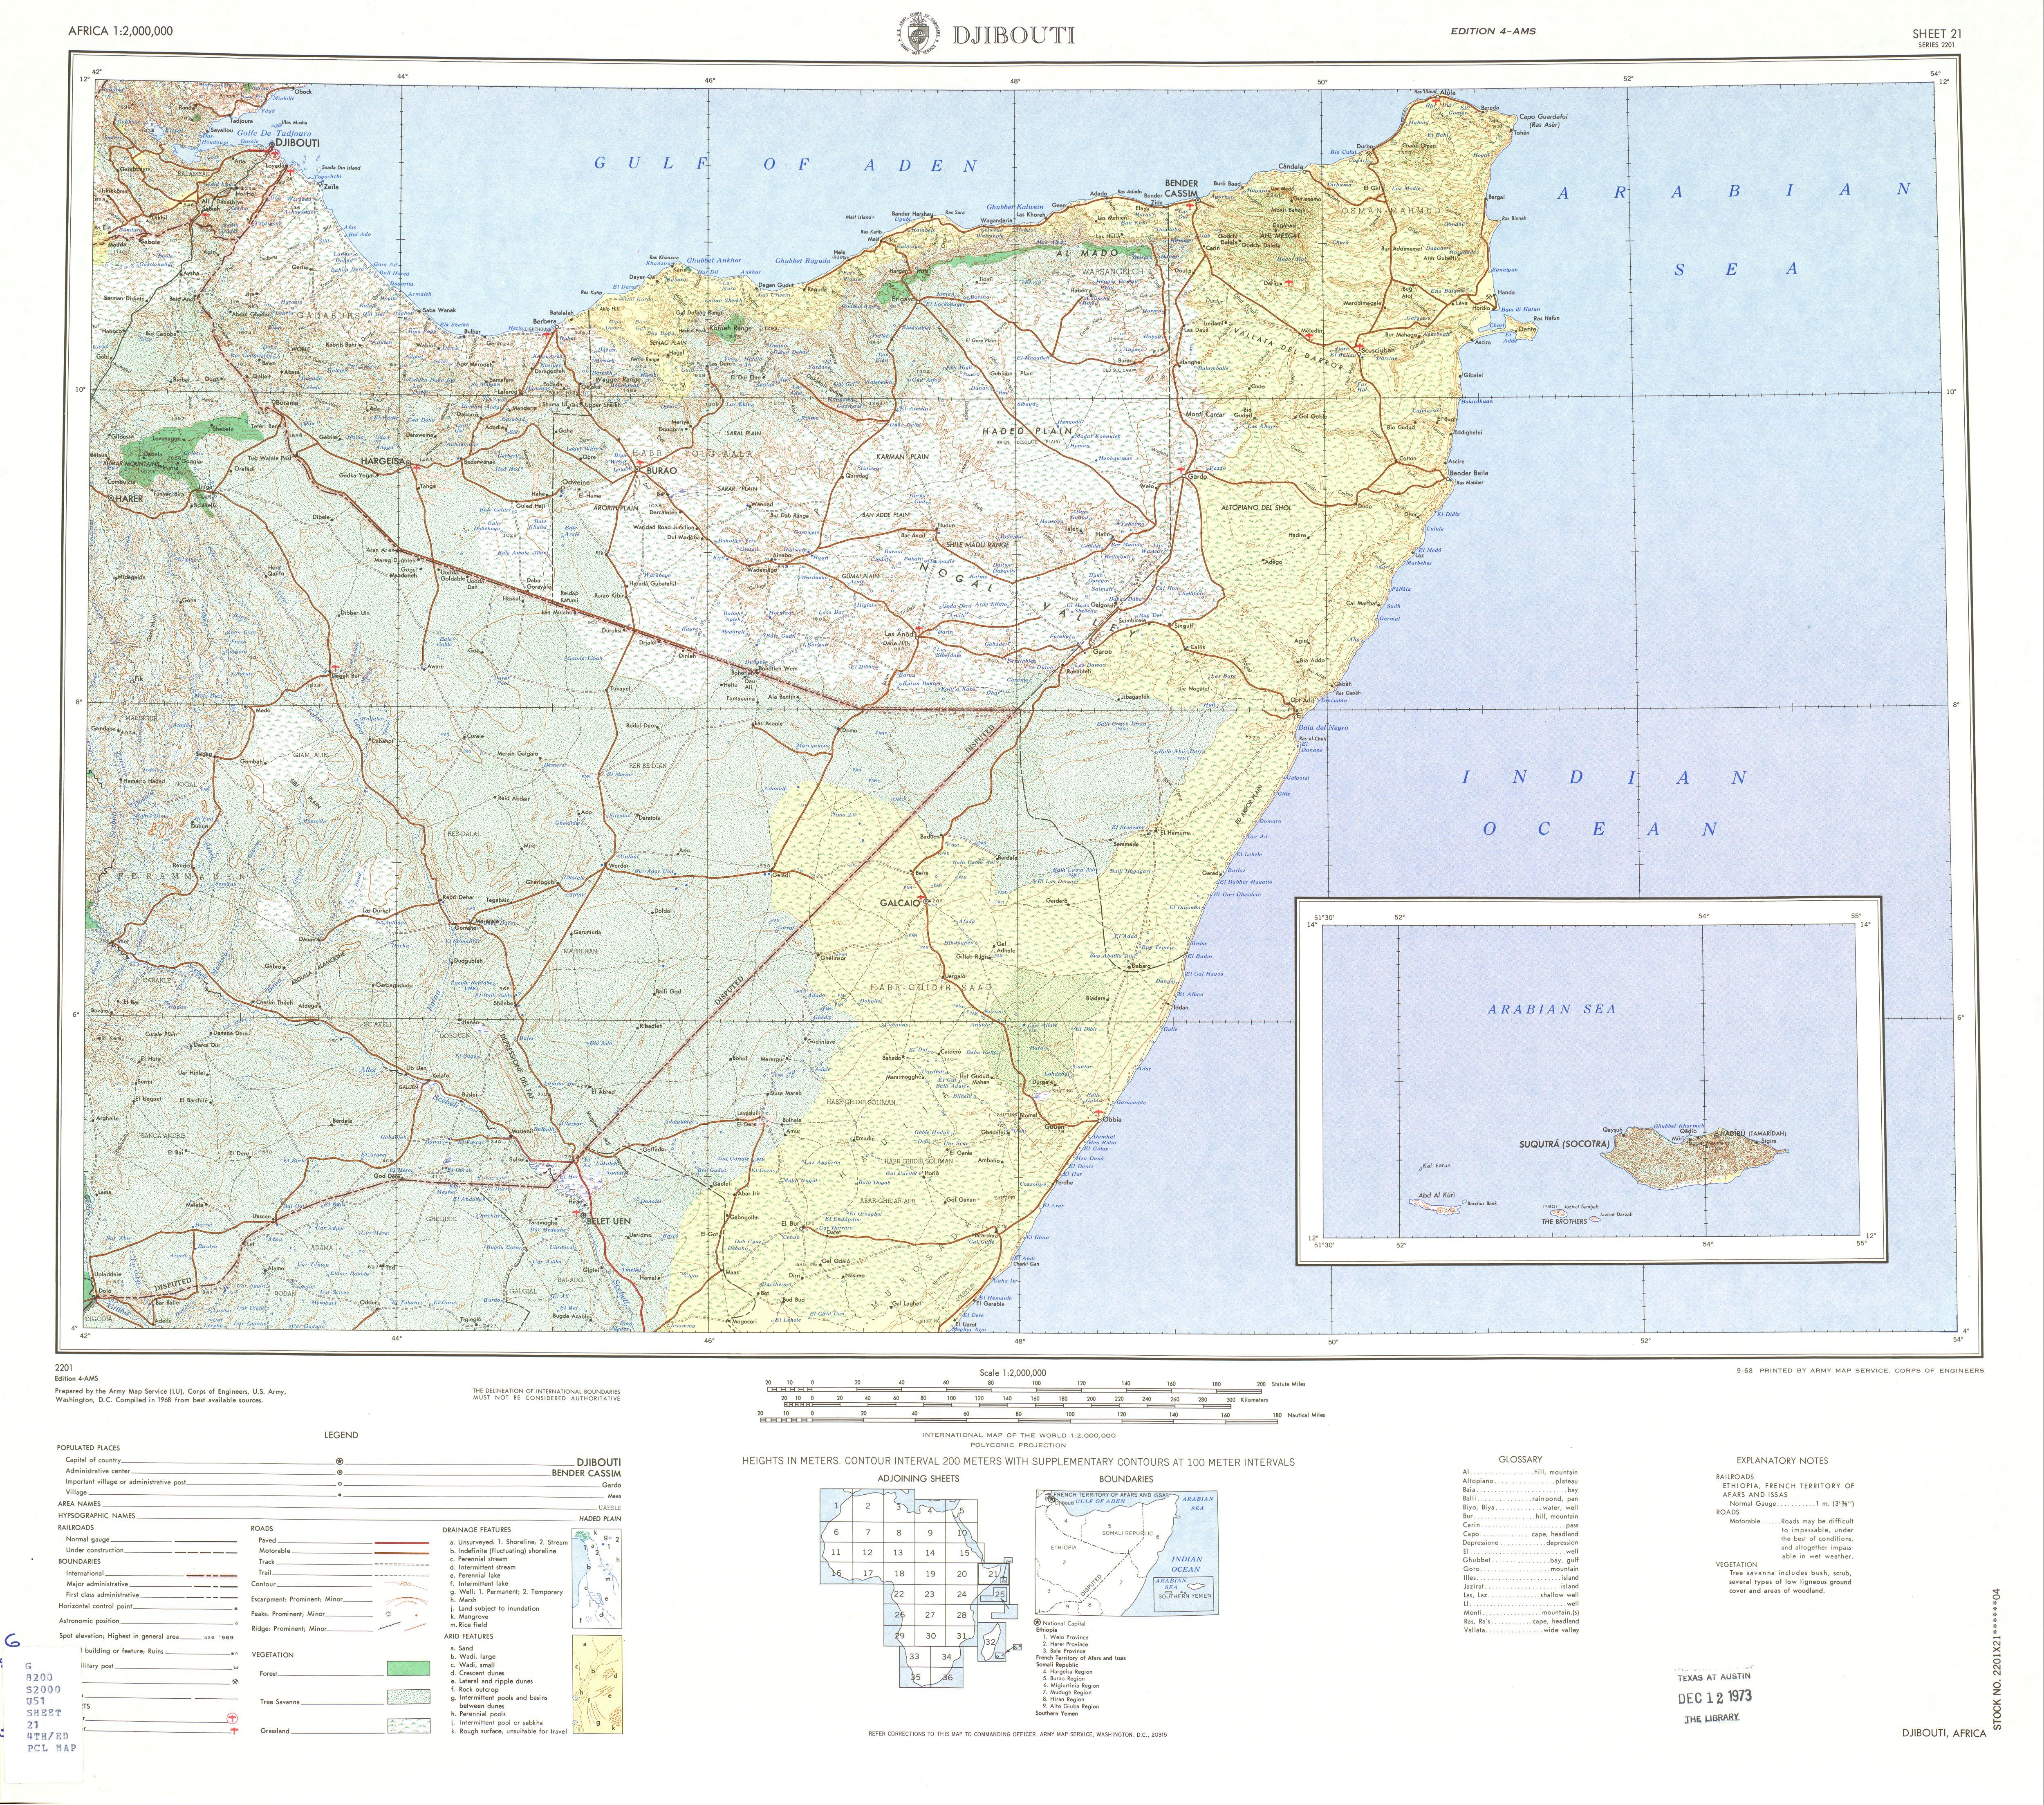 Hoja Yibuti del Mapa Topográfico de África 1968